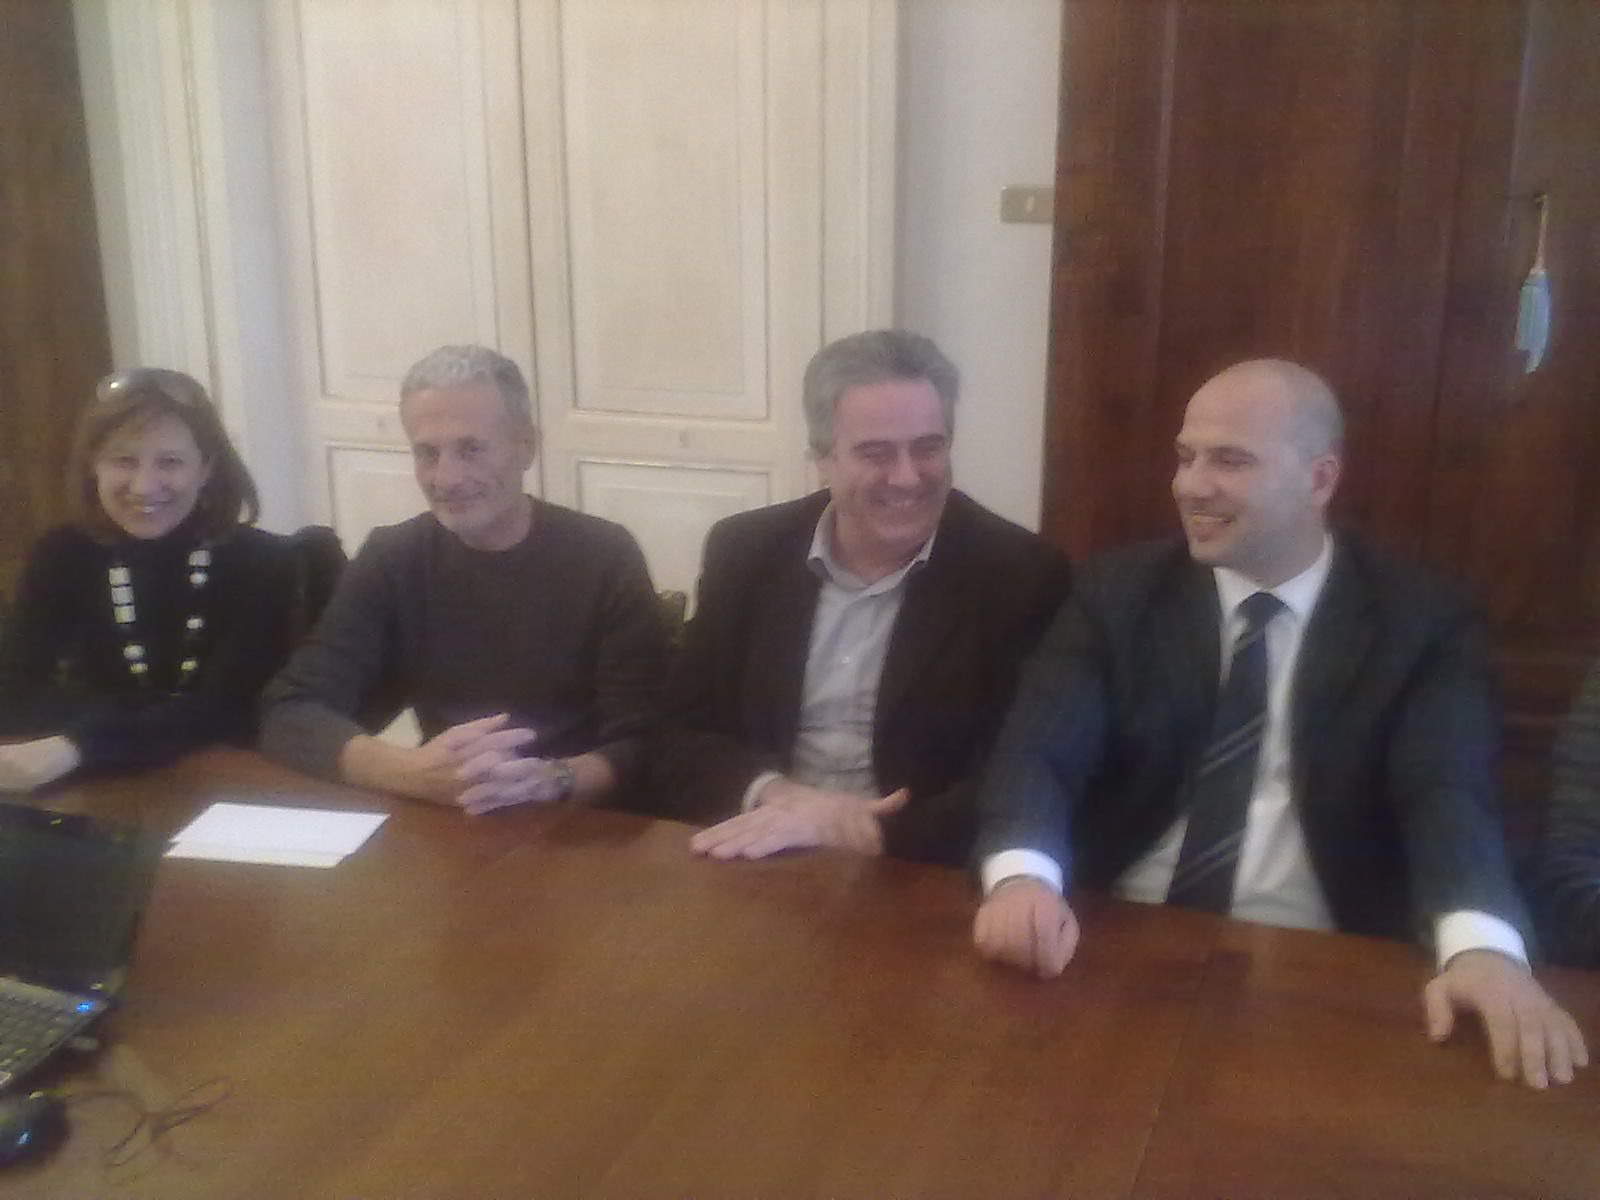 Serena Antonelli, Alberto Massari, Giampiero Grandoni, Valerio Lucciarini